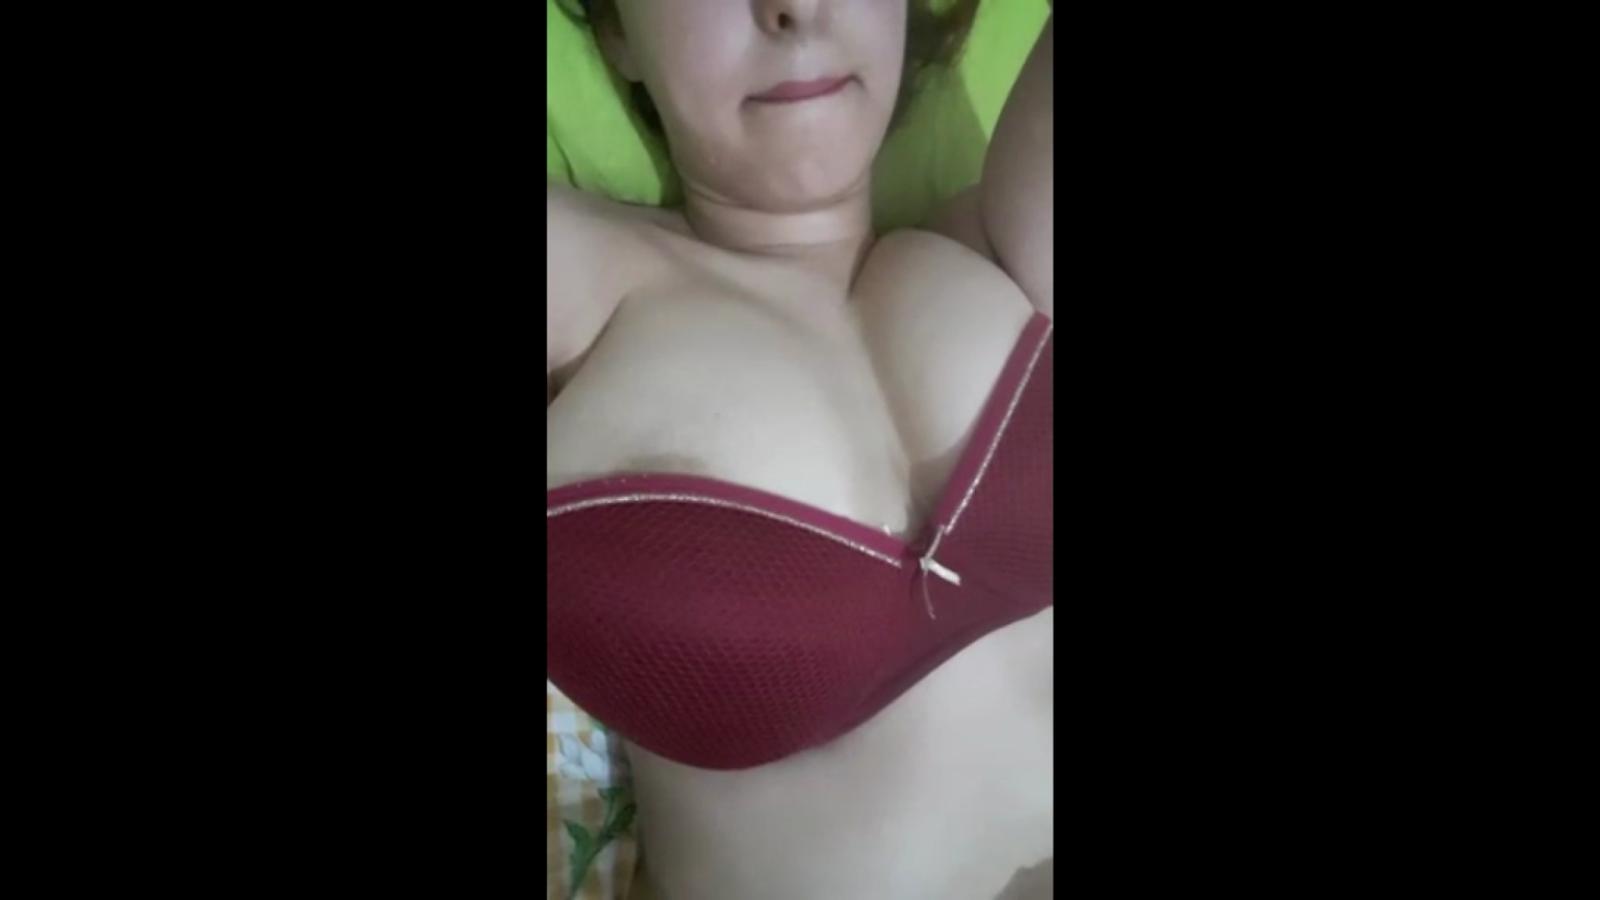 Turk Sesli Porno Videos  Pornhubcom